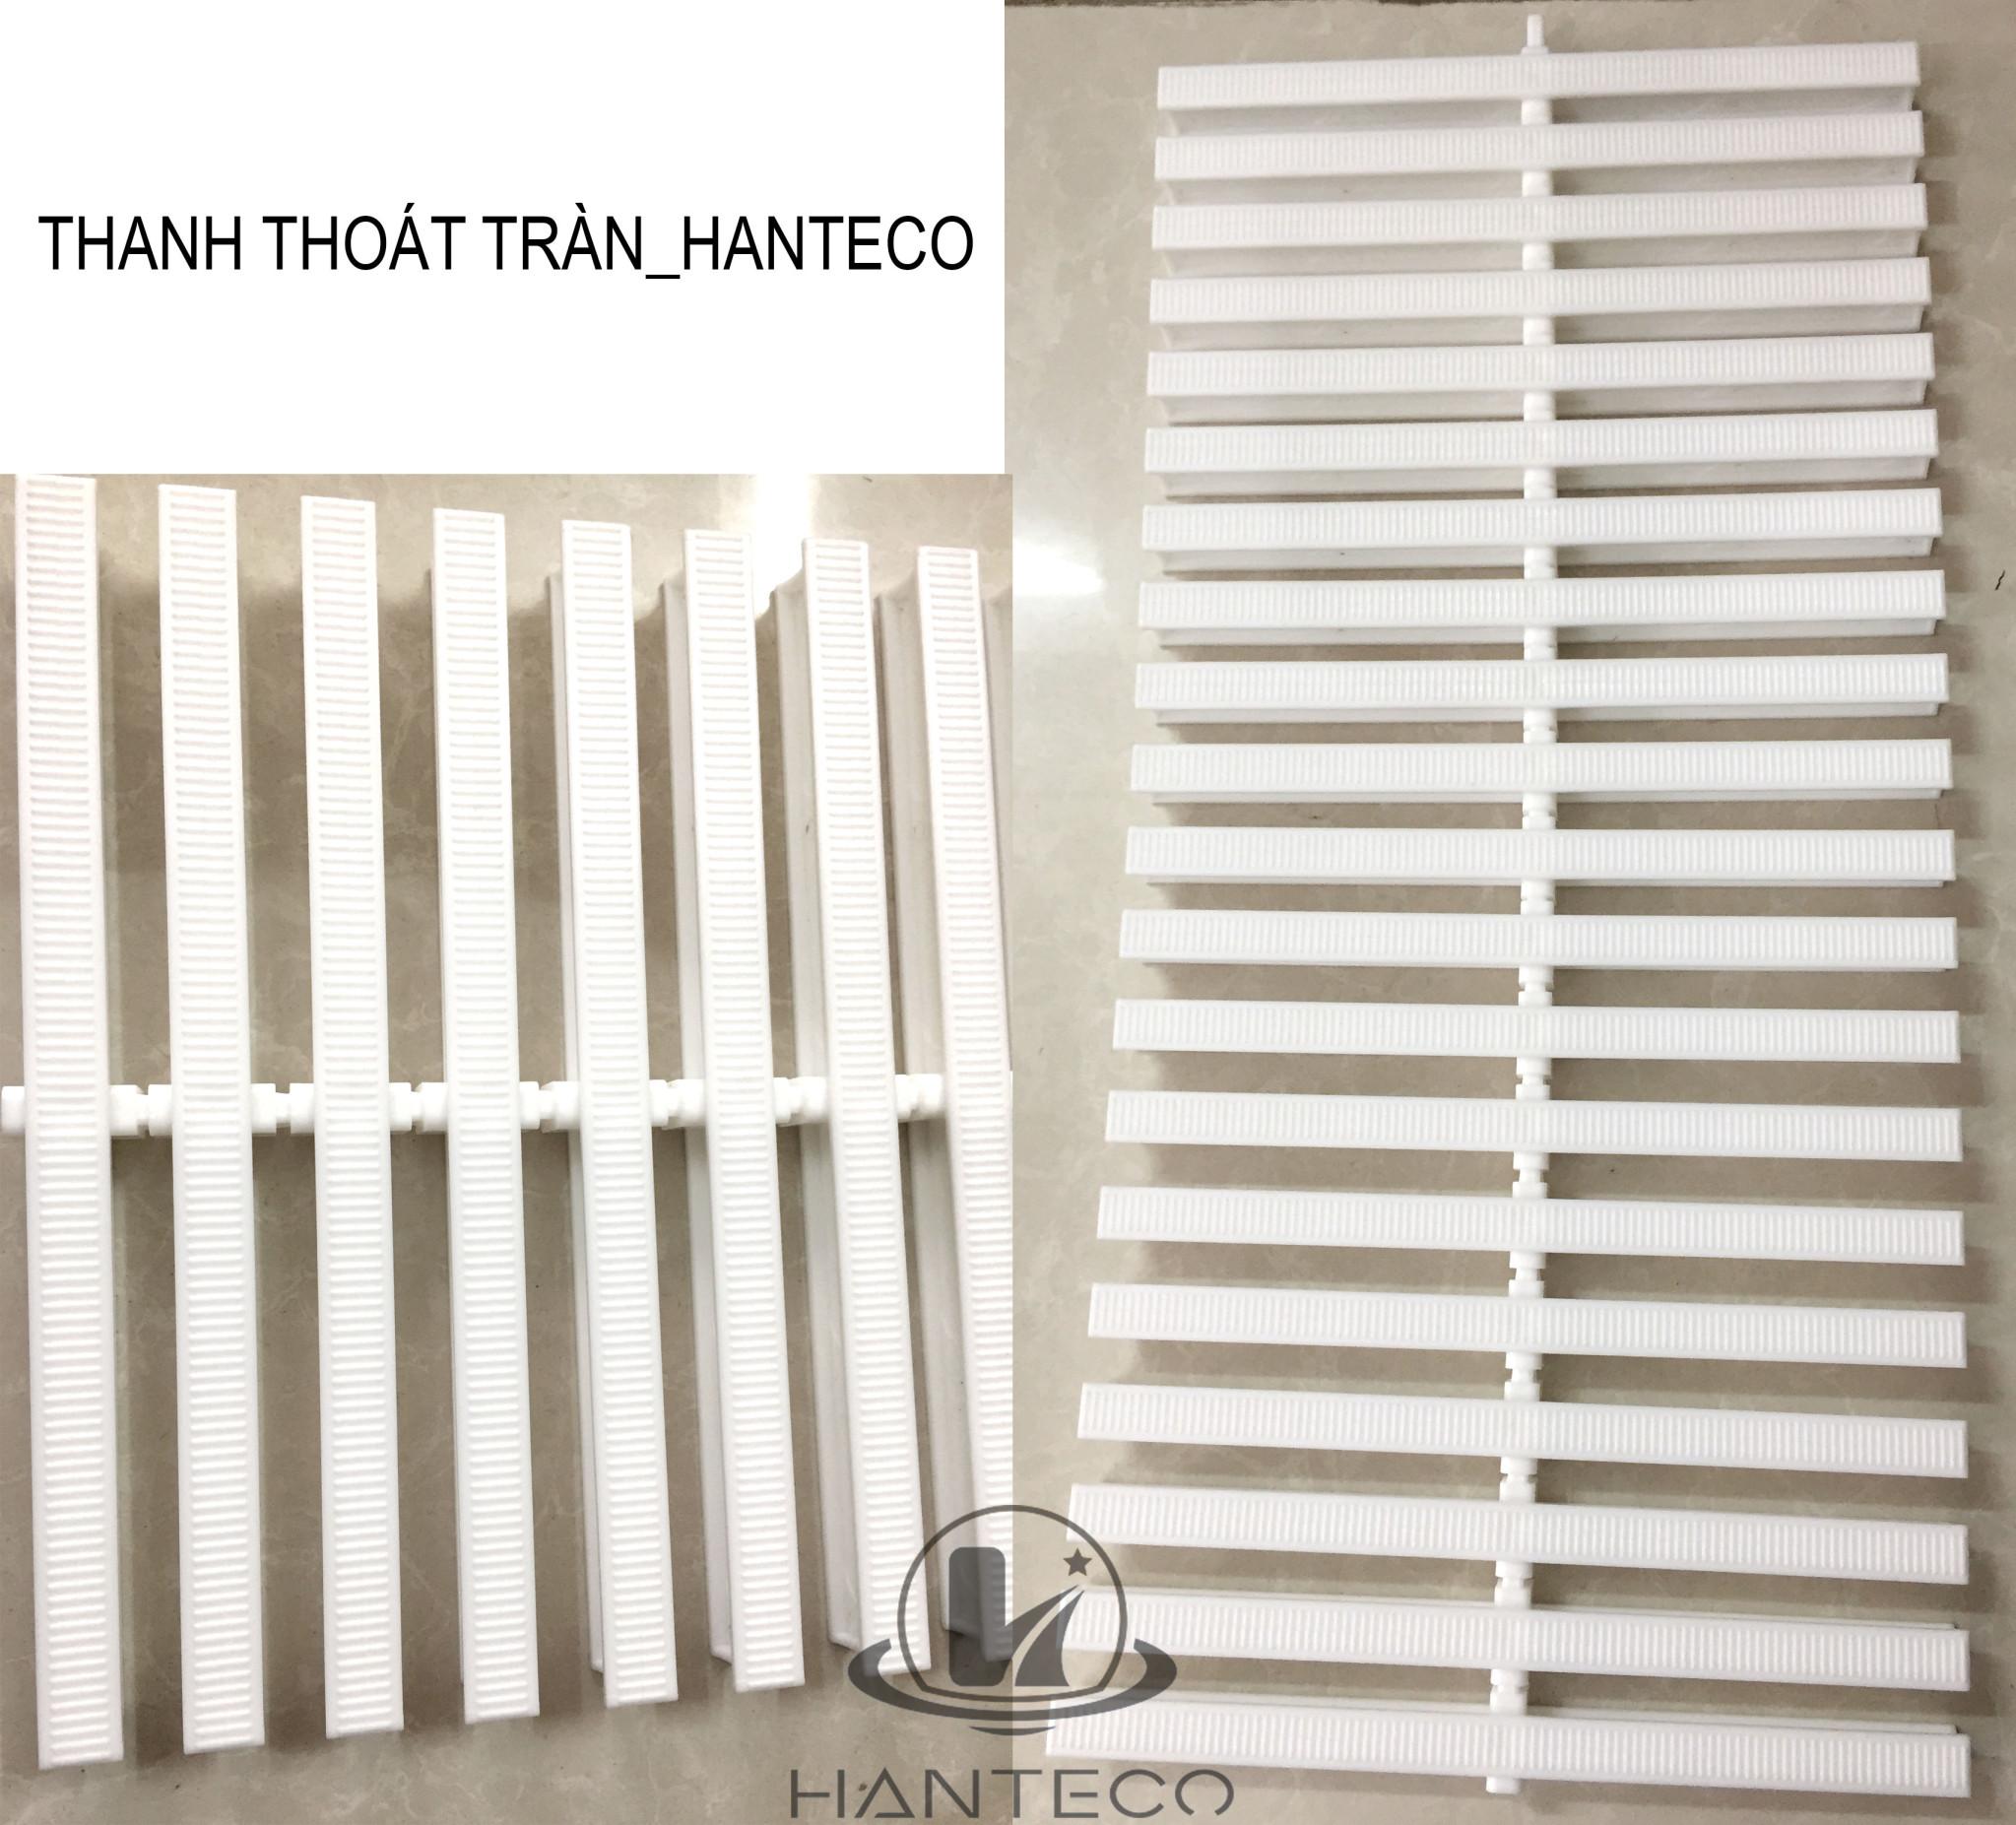 Thoat Tran Hanteco